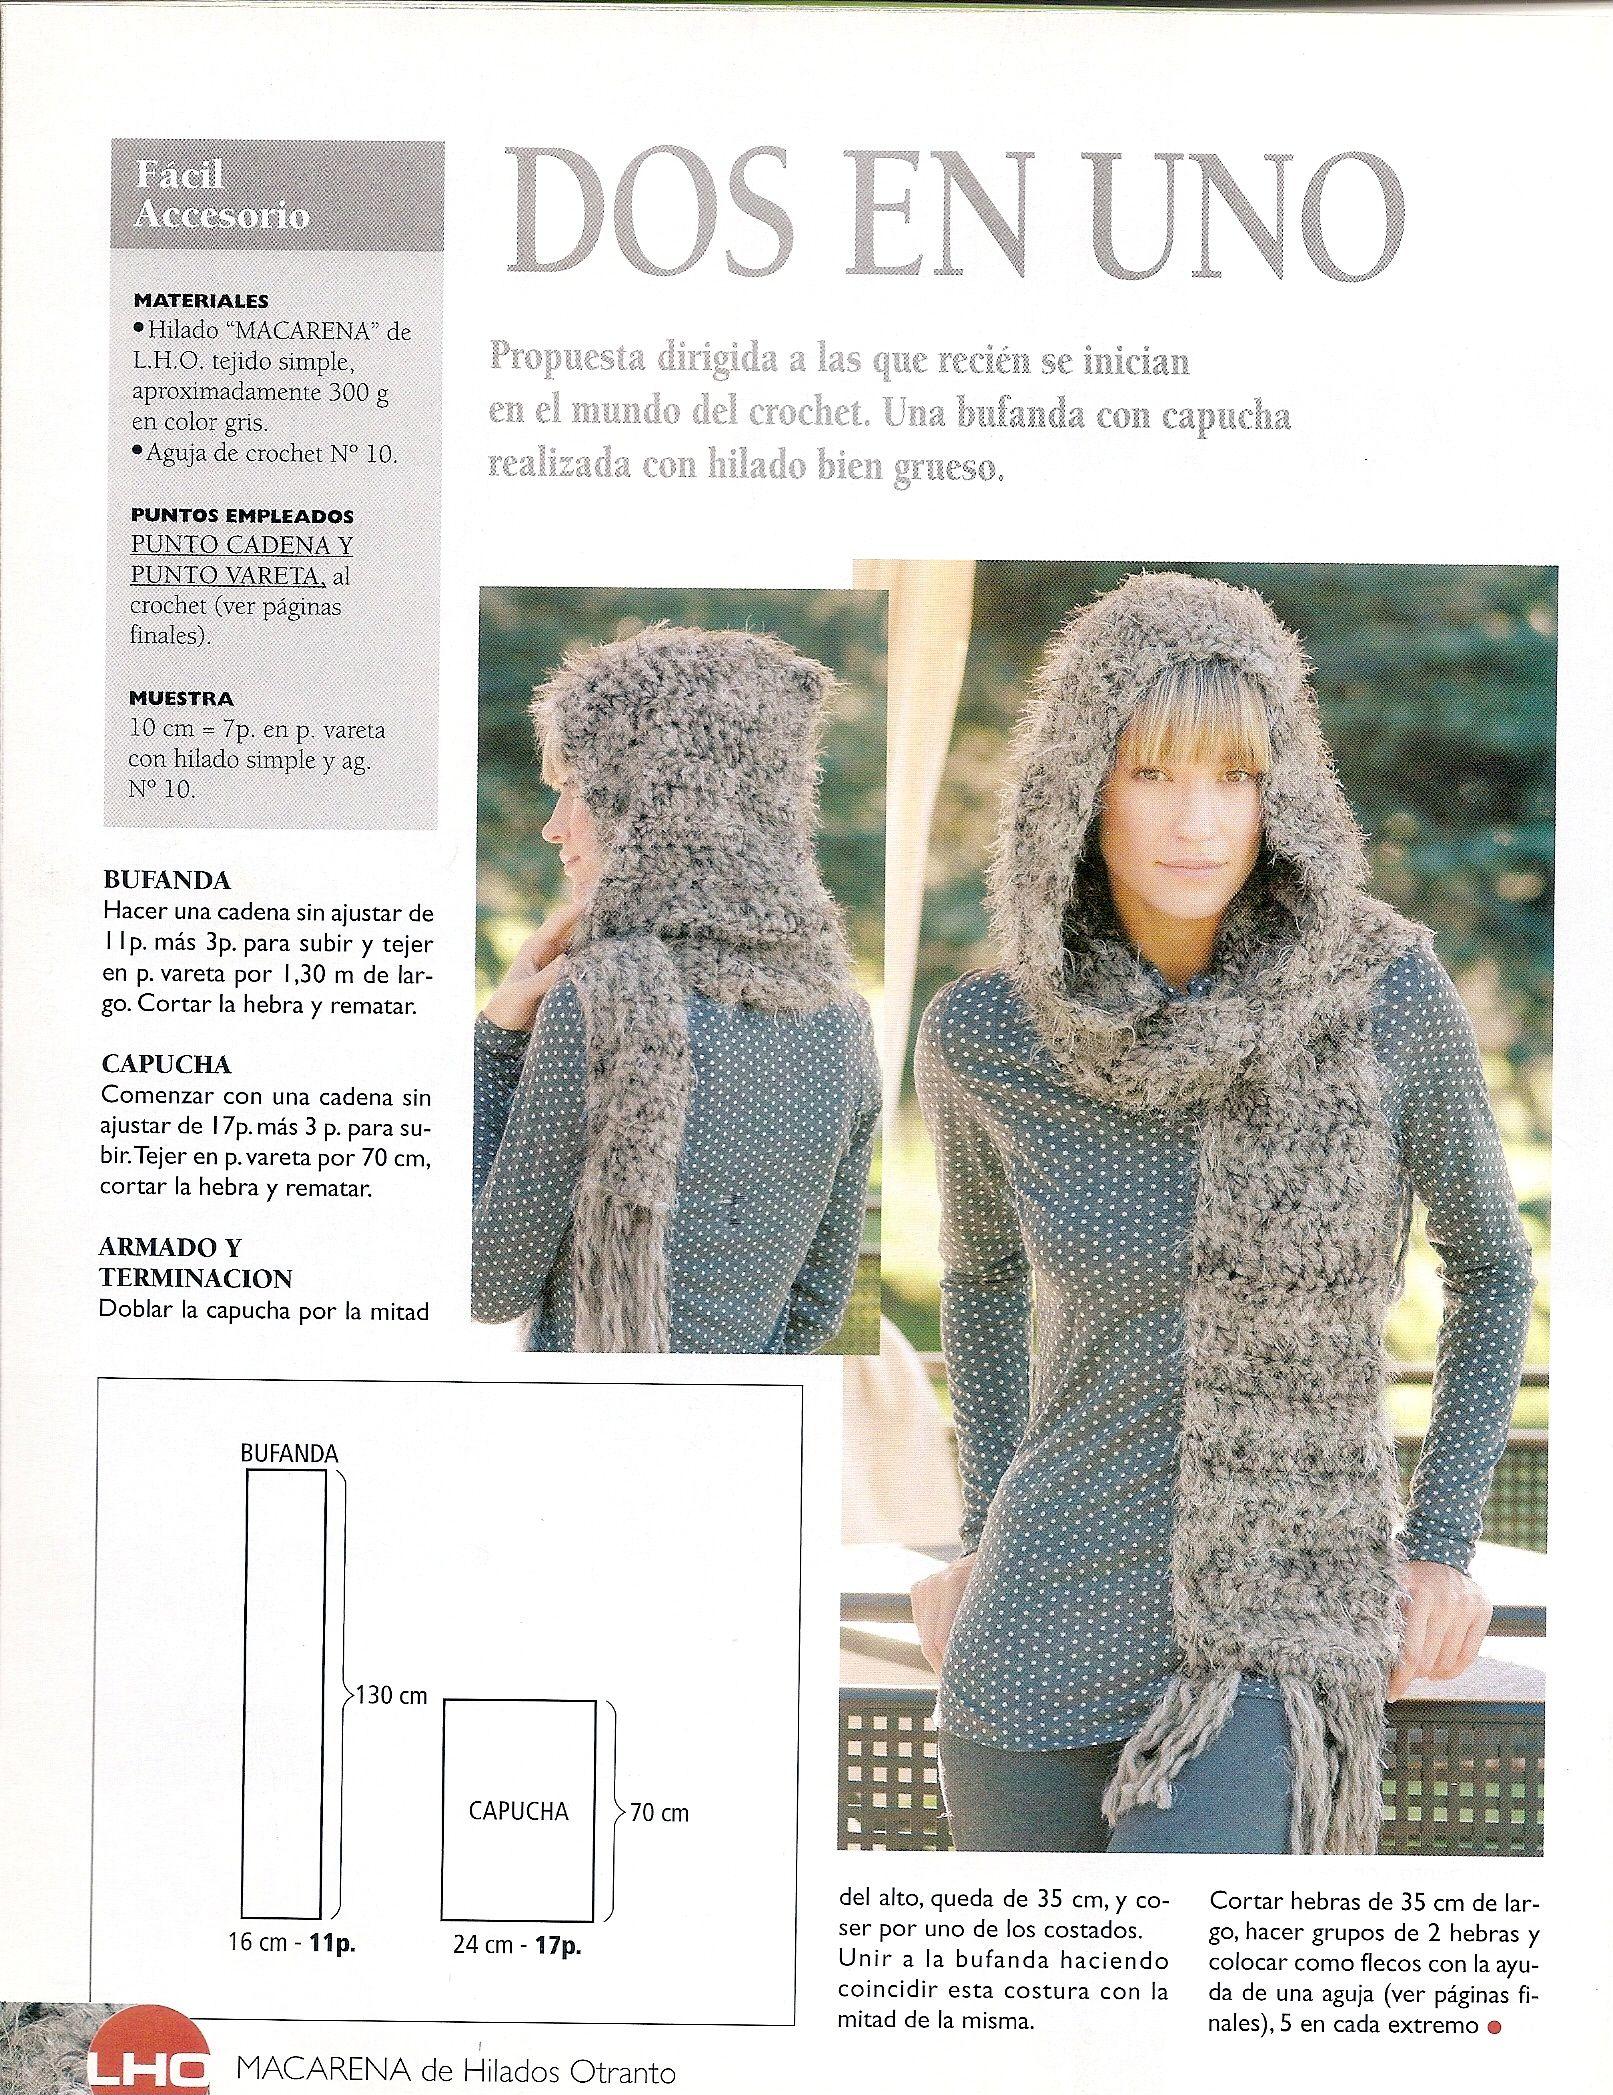 Gorro y bufanda a crochet | facebook | Pinterest | Tejido, Gorros y ...